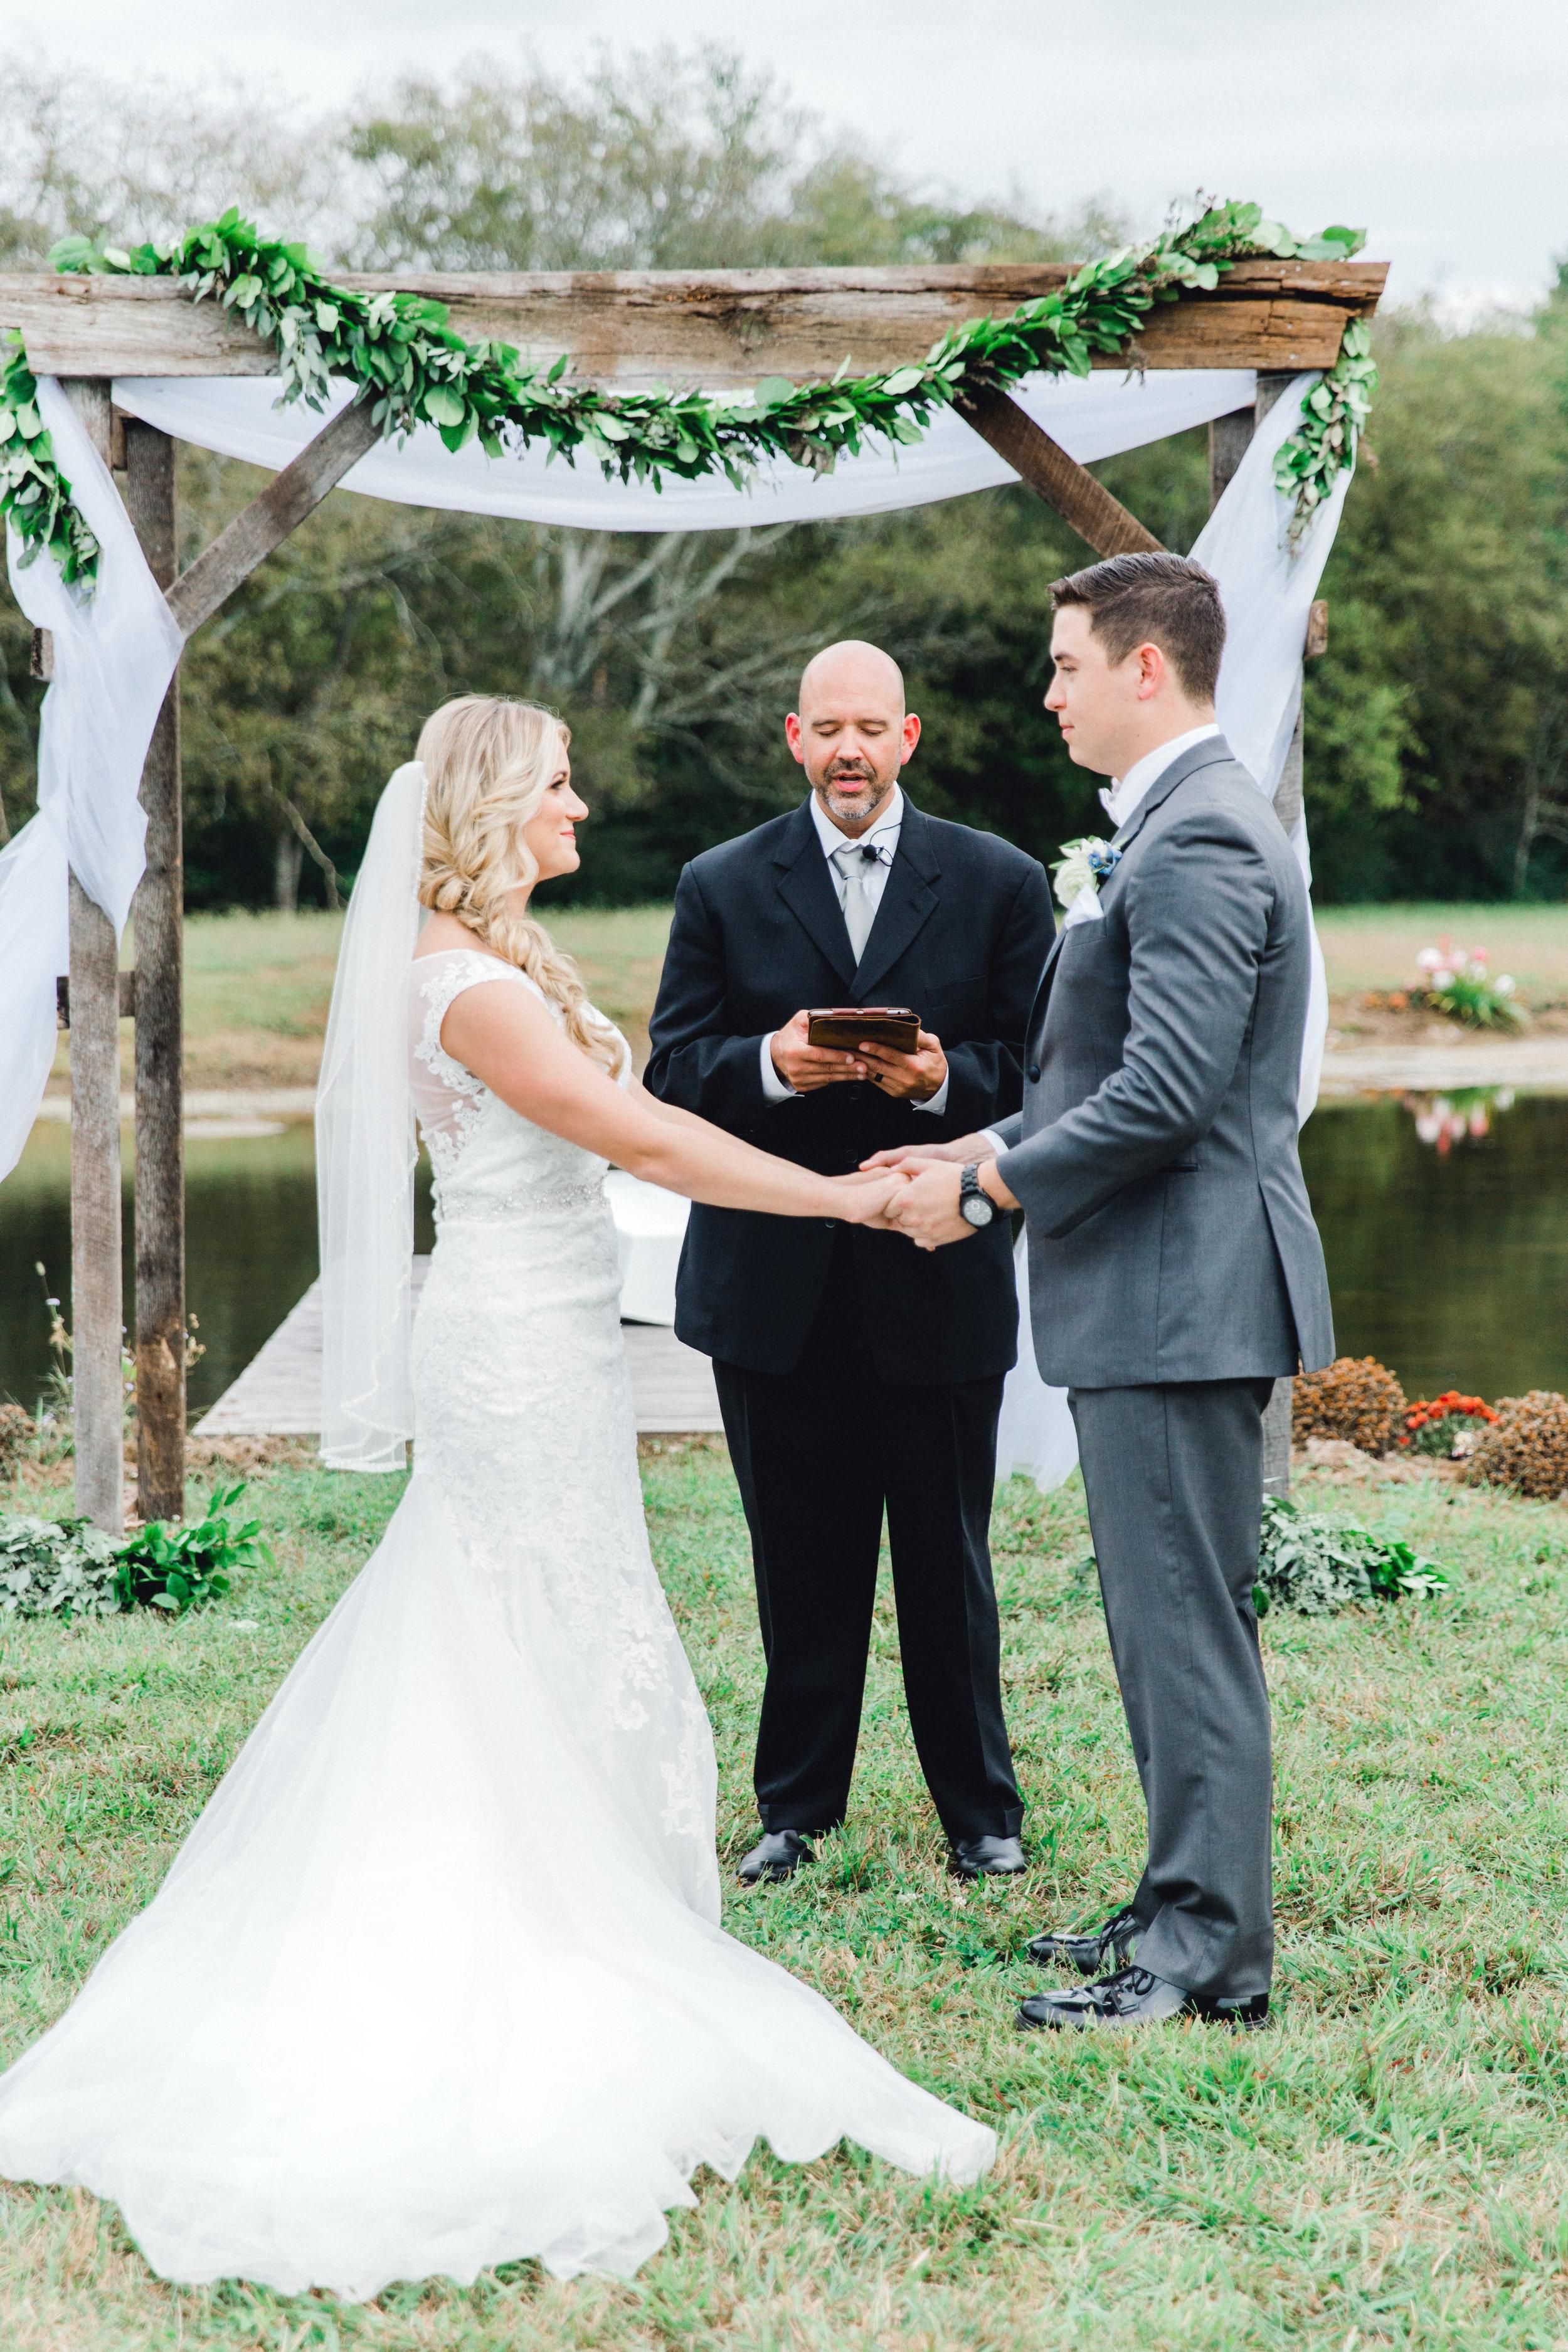 Paige-Mercer-Photography-Florida-Wedding-Photographer-Alyssa&Drew-45.jpg